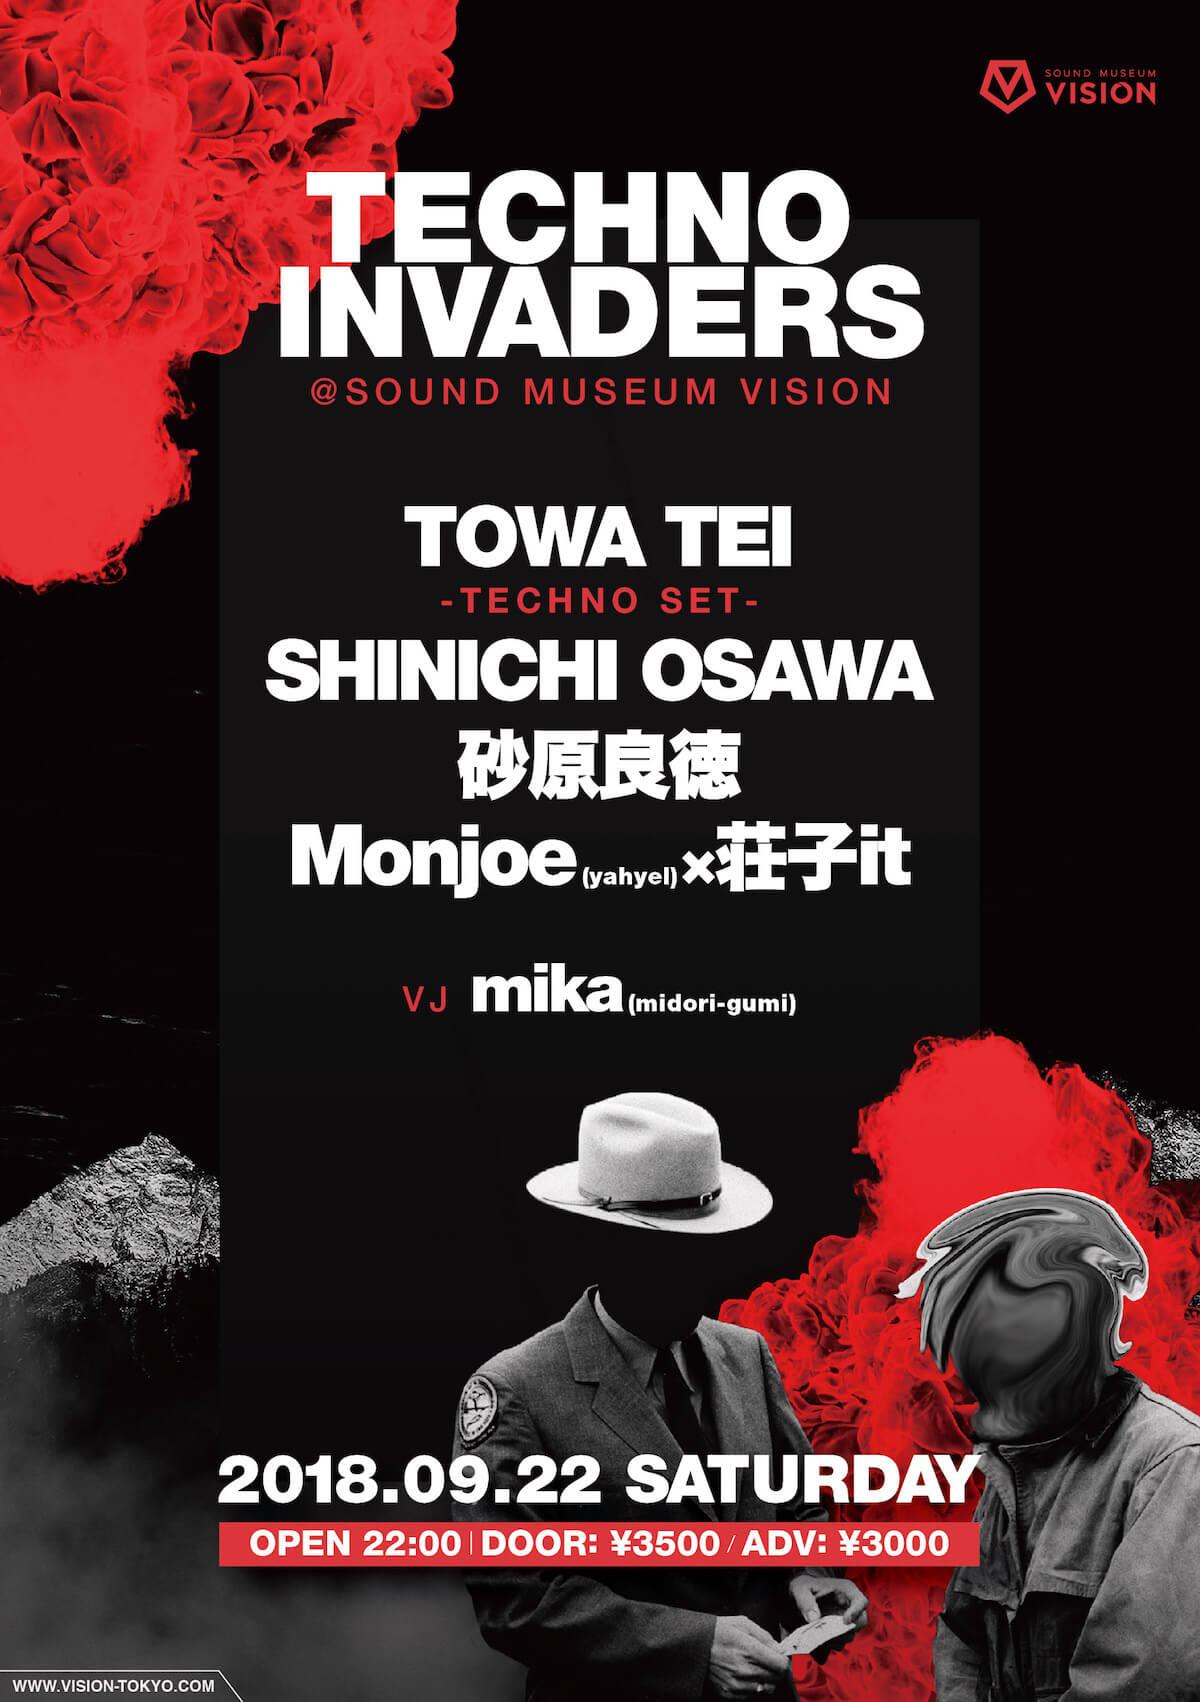 「TECHNO INVADERS」が9月21日に開催|TOWA TEIが貴重なテクノセットを披露 music180921-techno-invaders-3